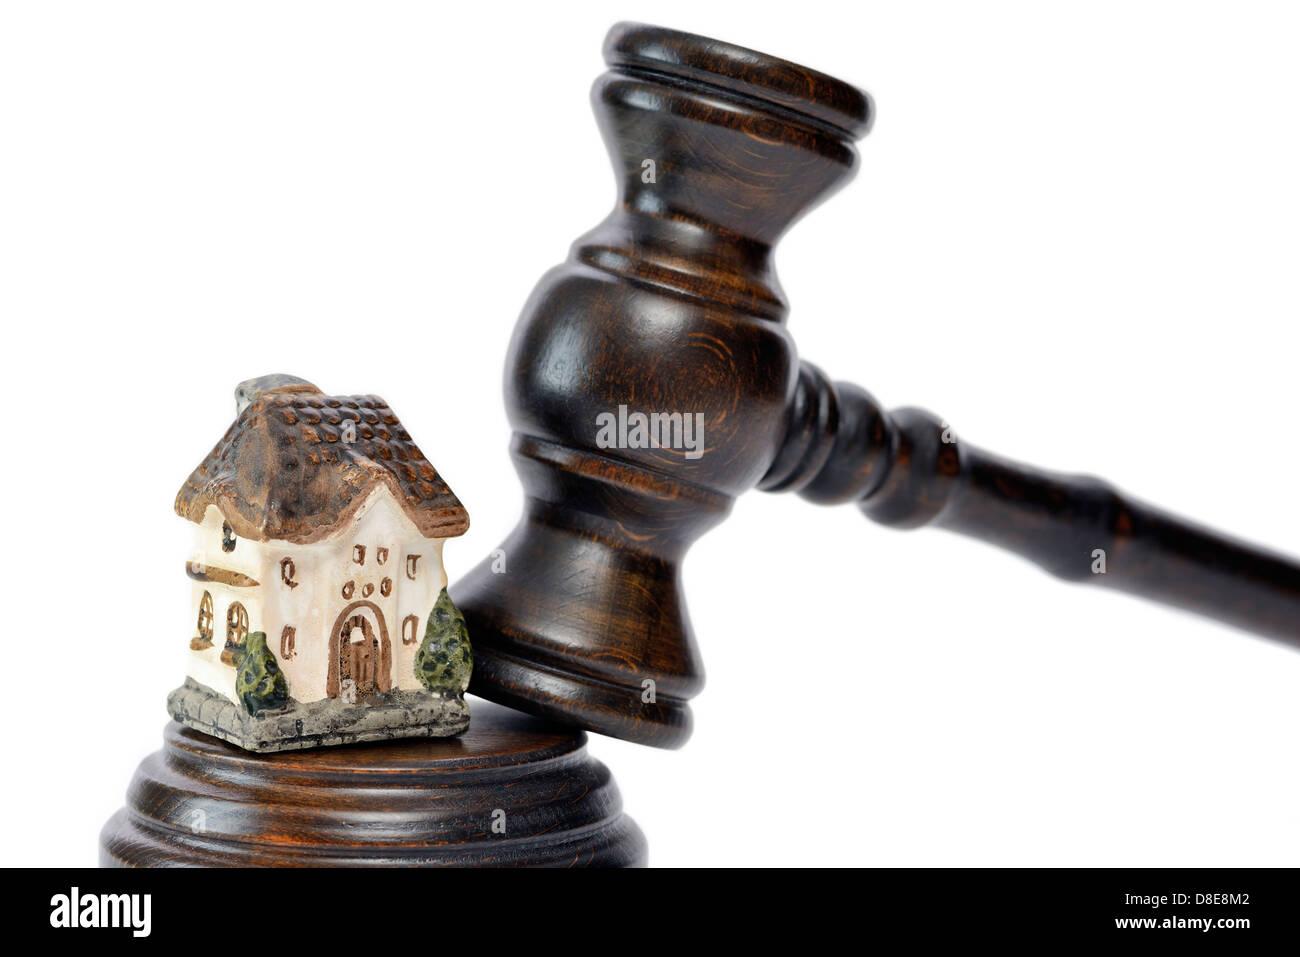 Gavel and miniature house symbol photo foreclosure - Stock Image